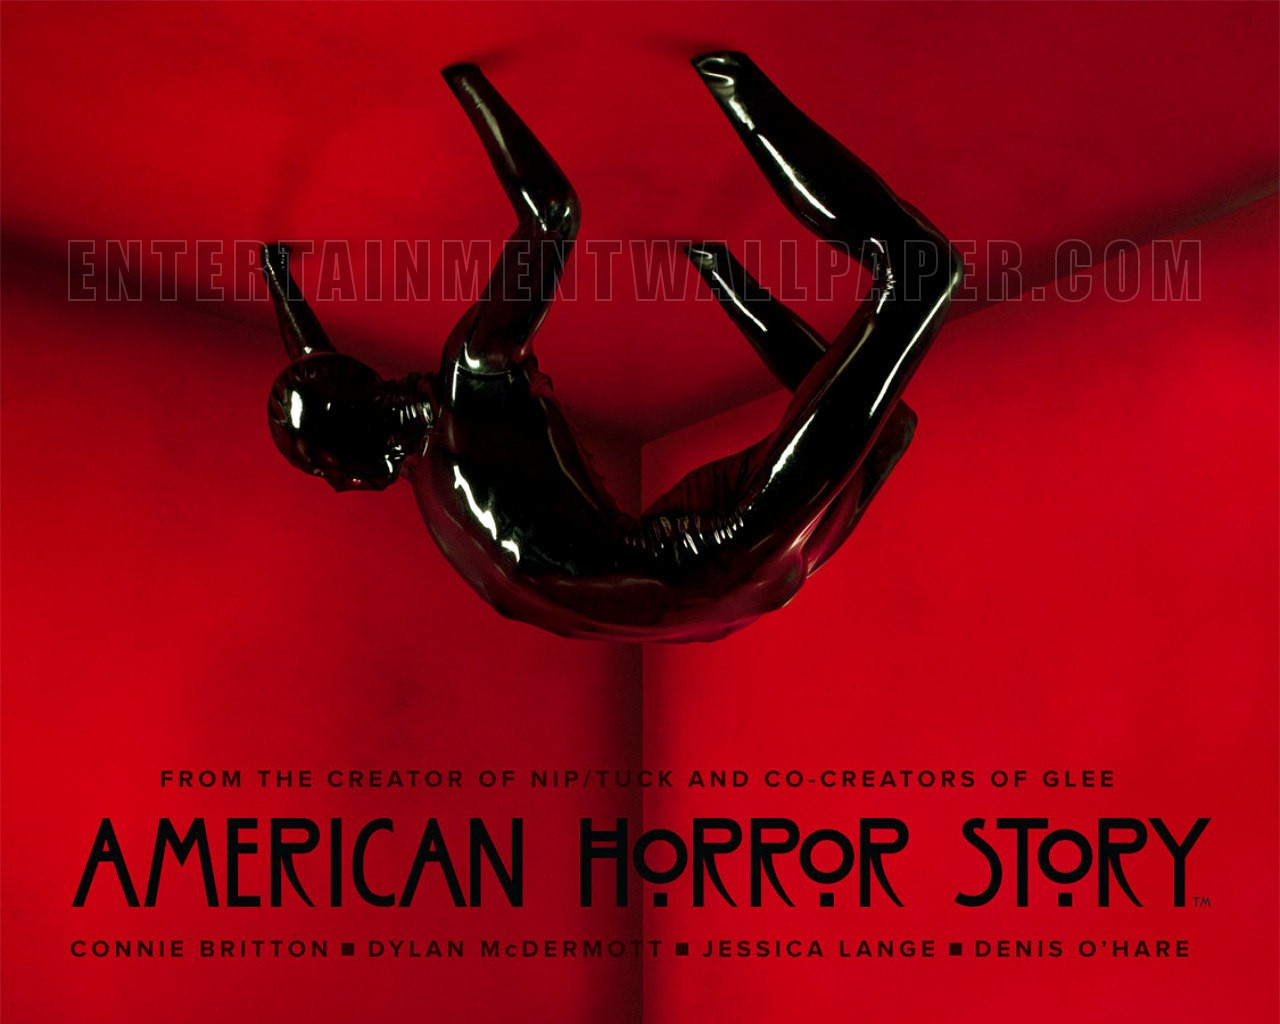 American Horror Story Fondo De Pantalla American Horror